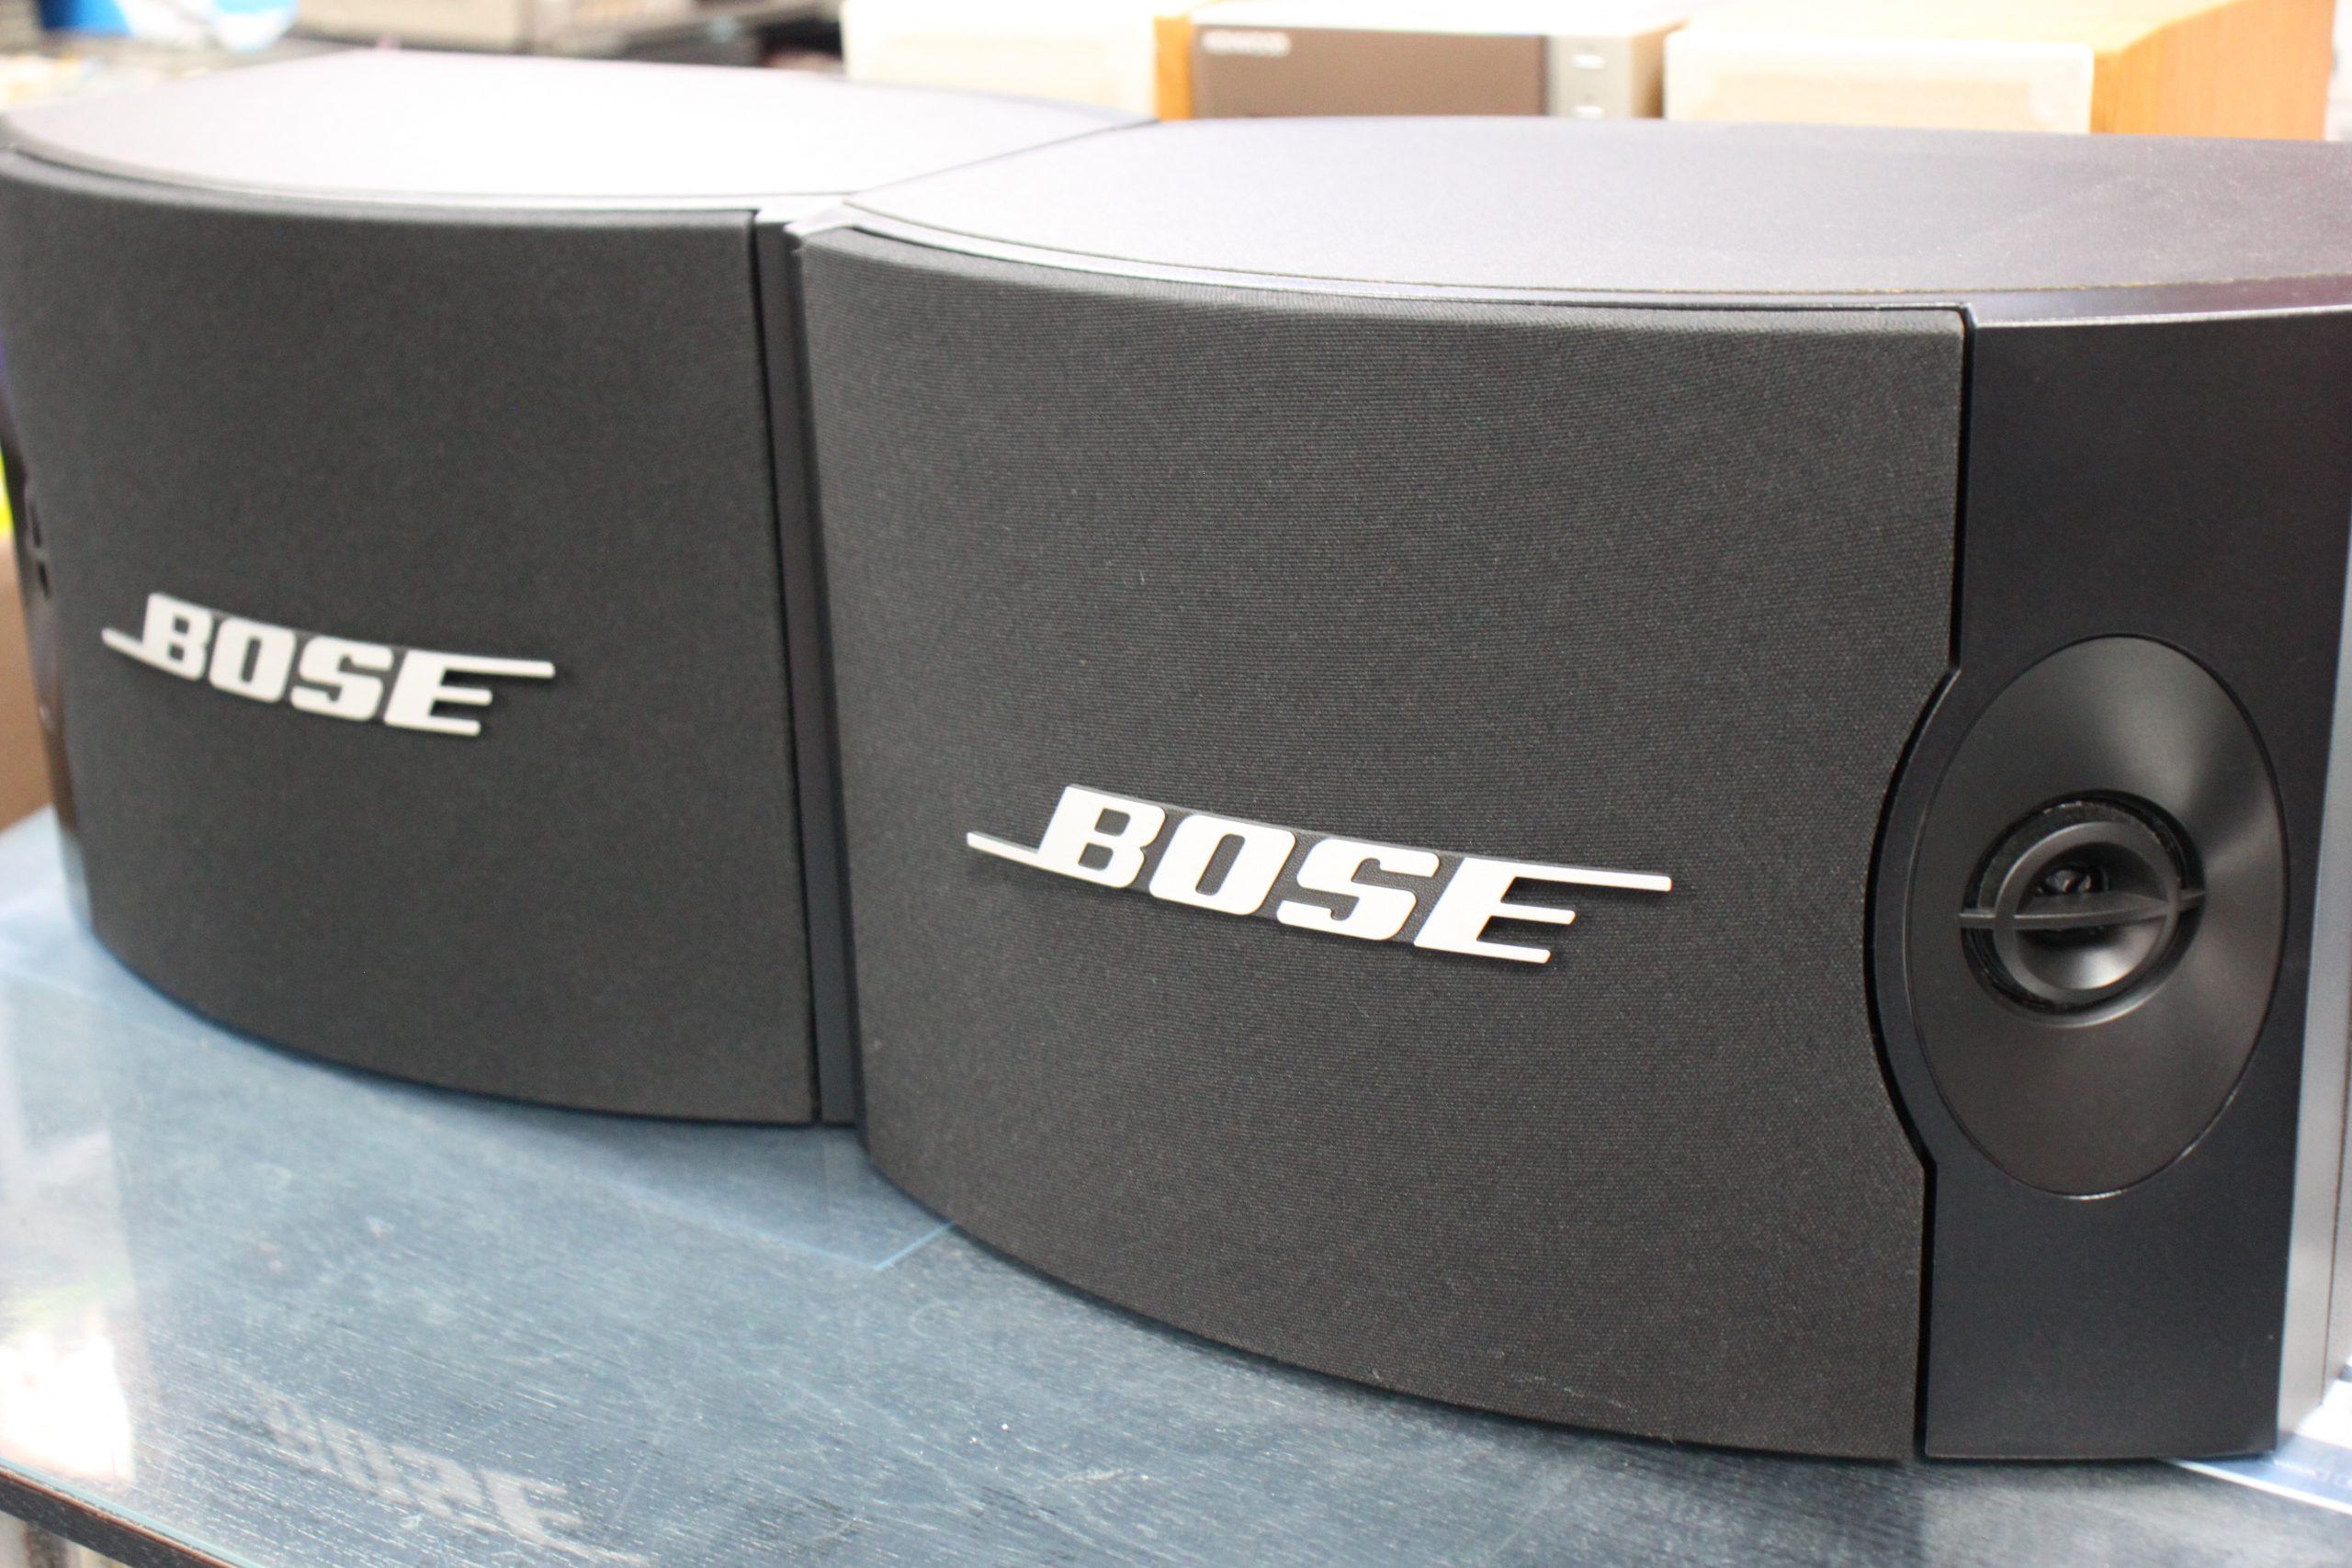 【BOSE】ダイレクト/リフレクティングスピーカー301V